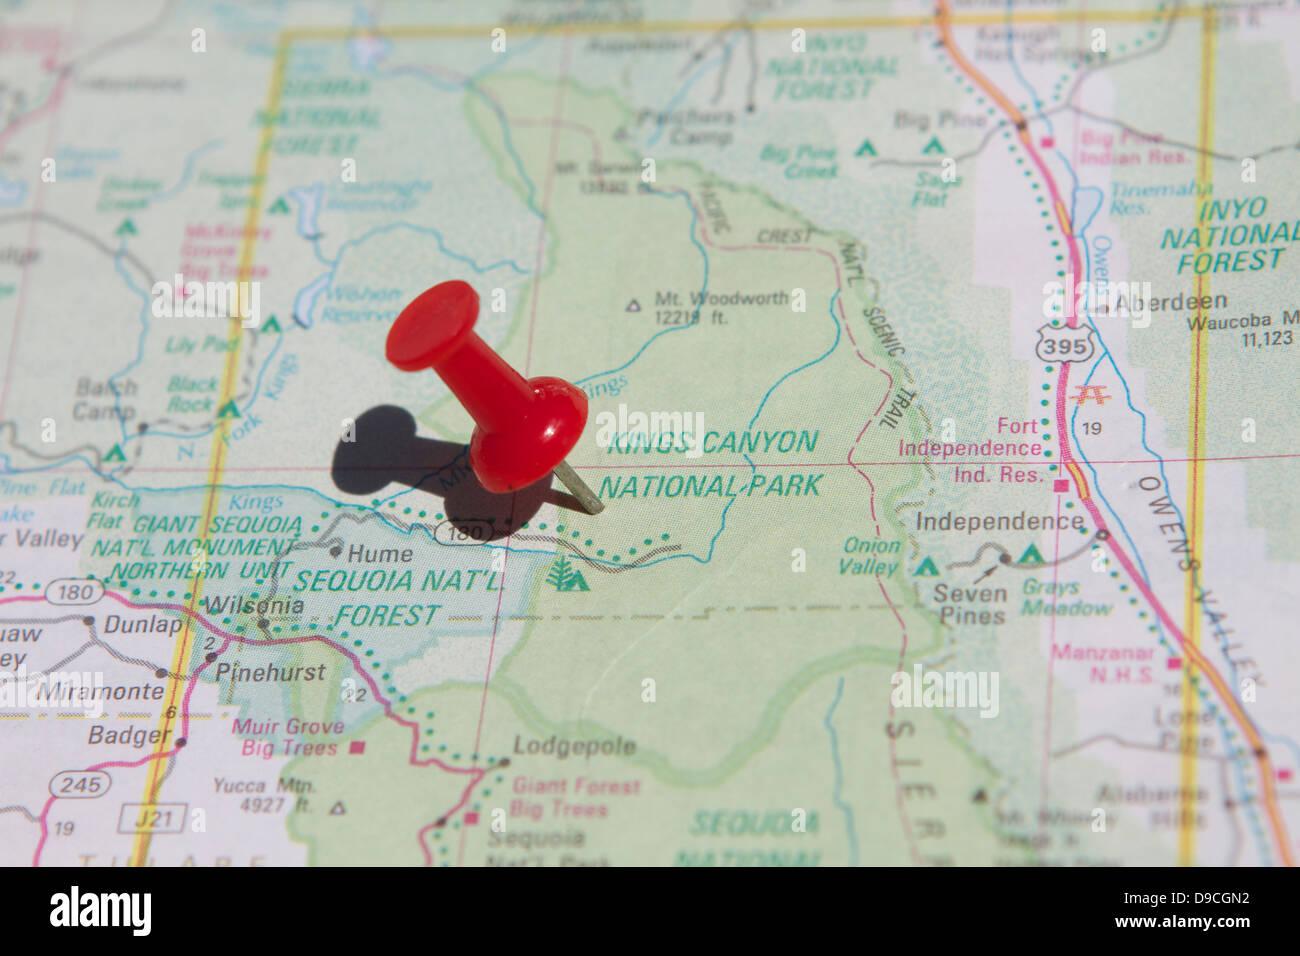 Map National Parks Usa Stockfotos & Map National Parks Usa ...